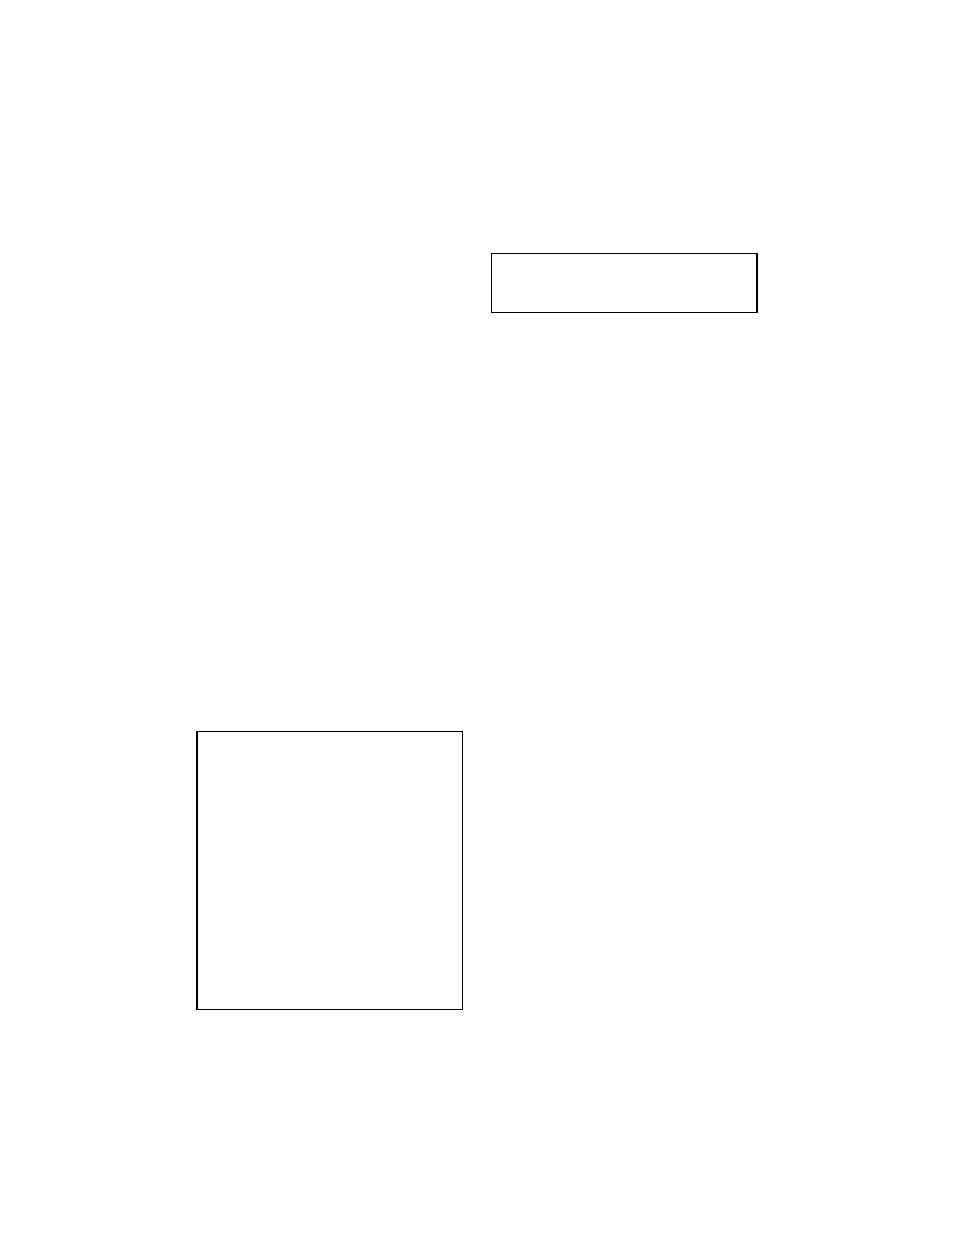 General information | Equus 3568 - INNOVA Digital Timing Light User Manual  | Page 5 / 12